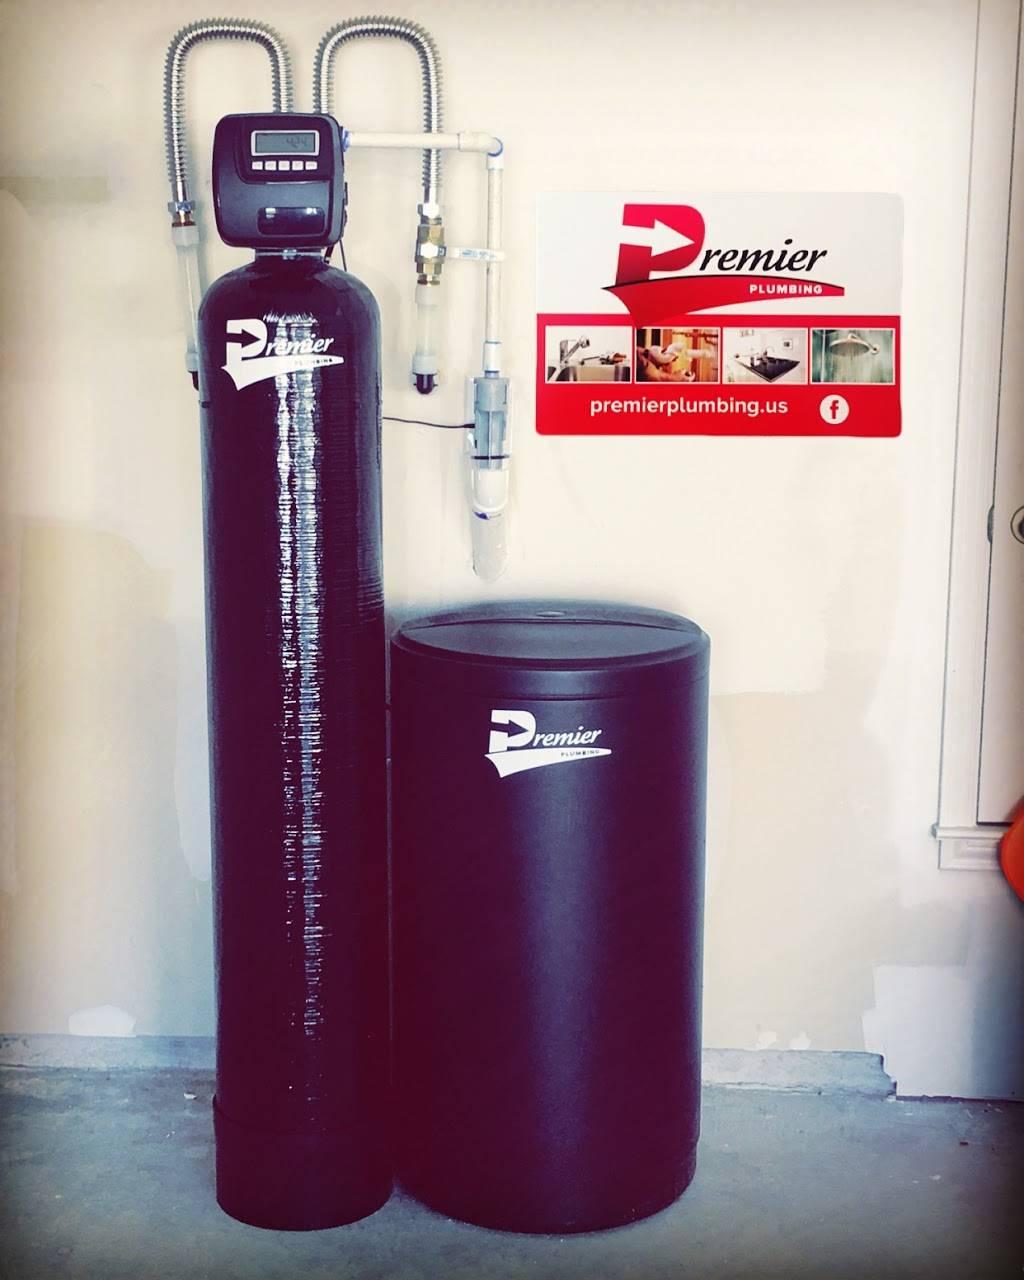 Premier Plumbing Services - plumber    Photo 3 of 10   Address: 122 Ryan Dr, San Antonio, TX 78223, USA   Phone: (210) 322-8232